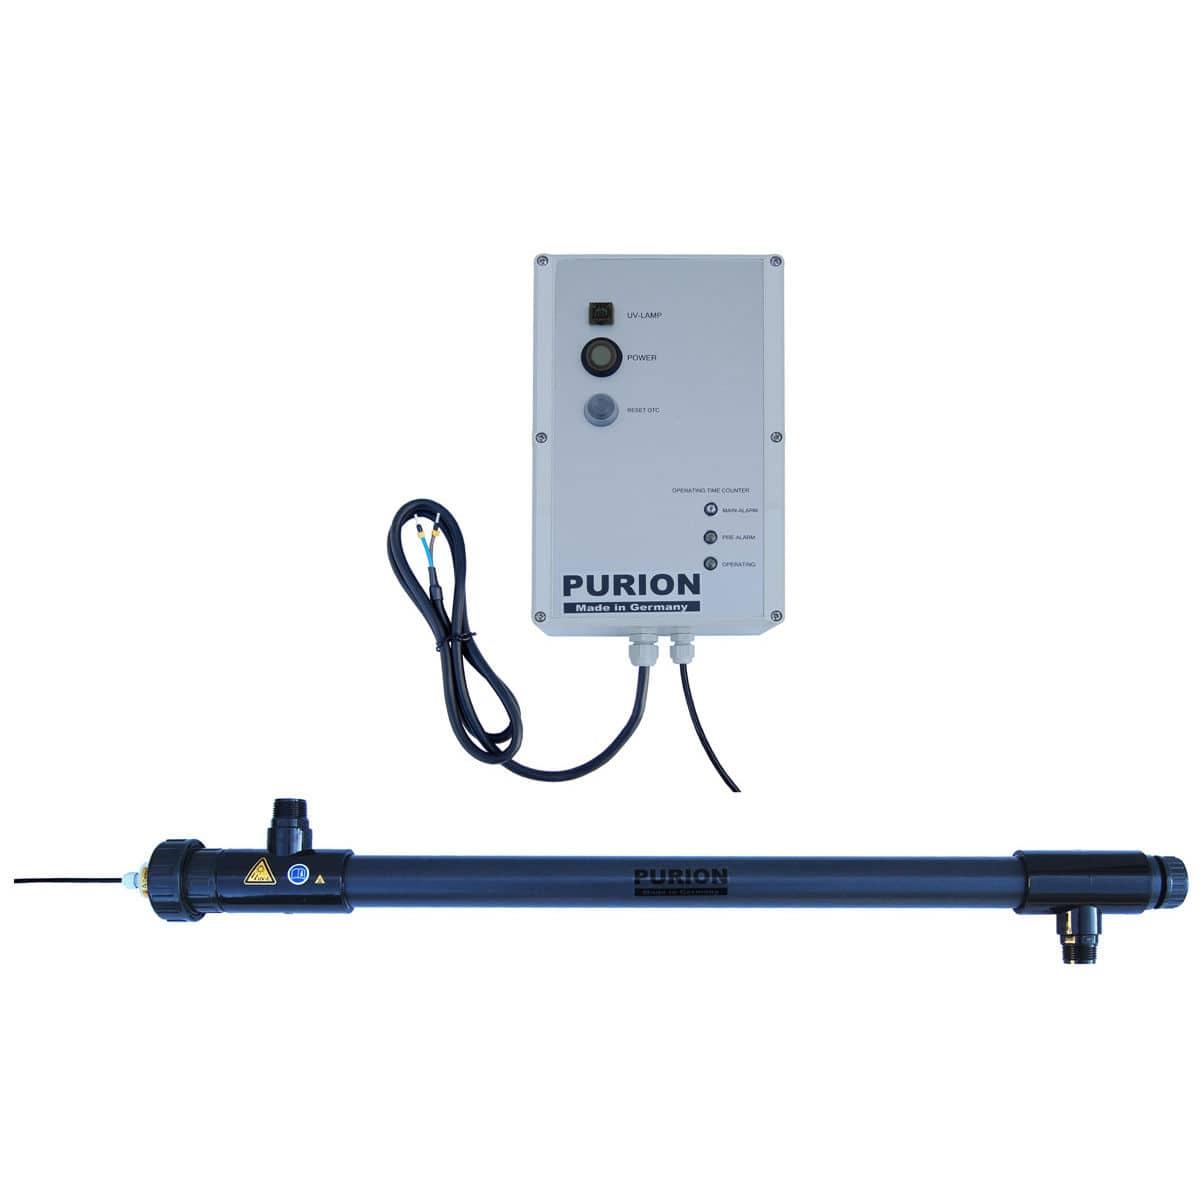 Purion® Uv 2500 Lampe U Pvc 1 Desinfektionseinheit 36 Wasser W GMzVSUqp